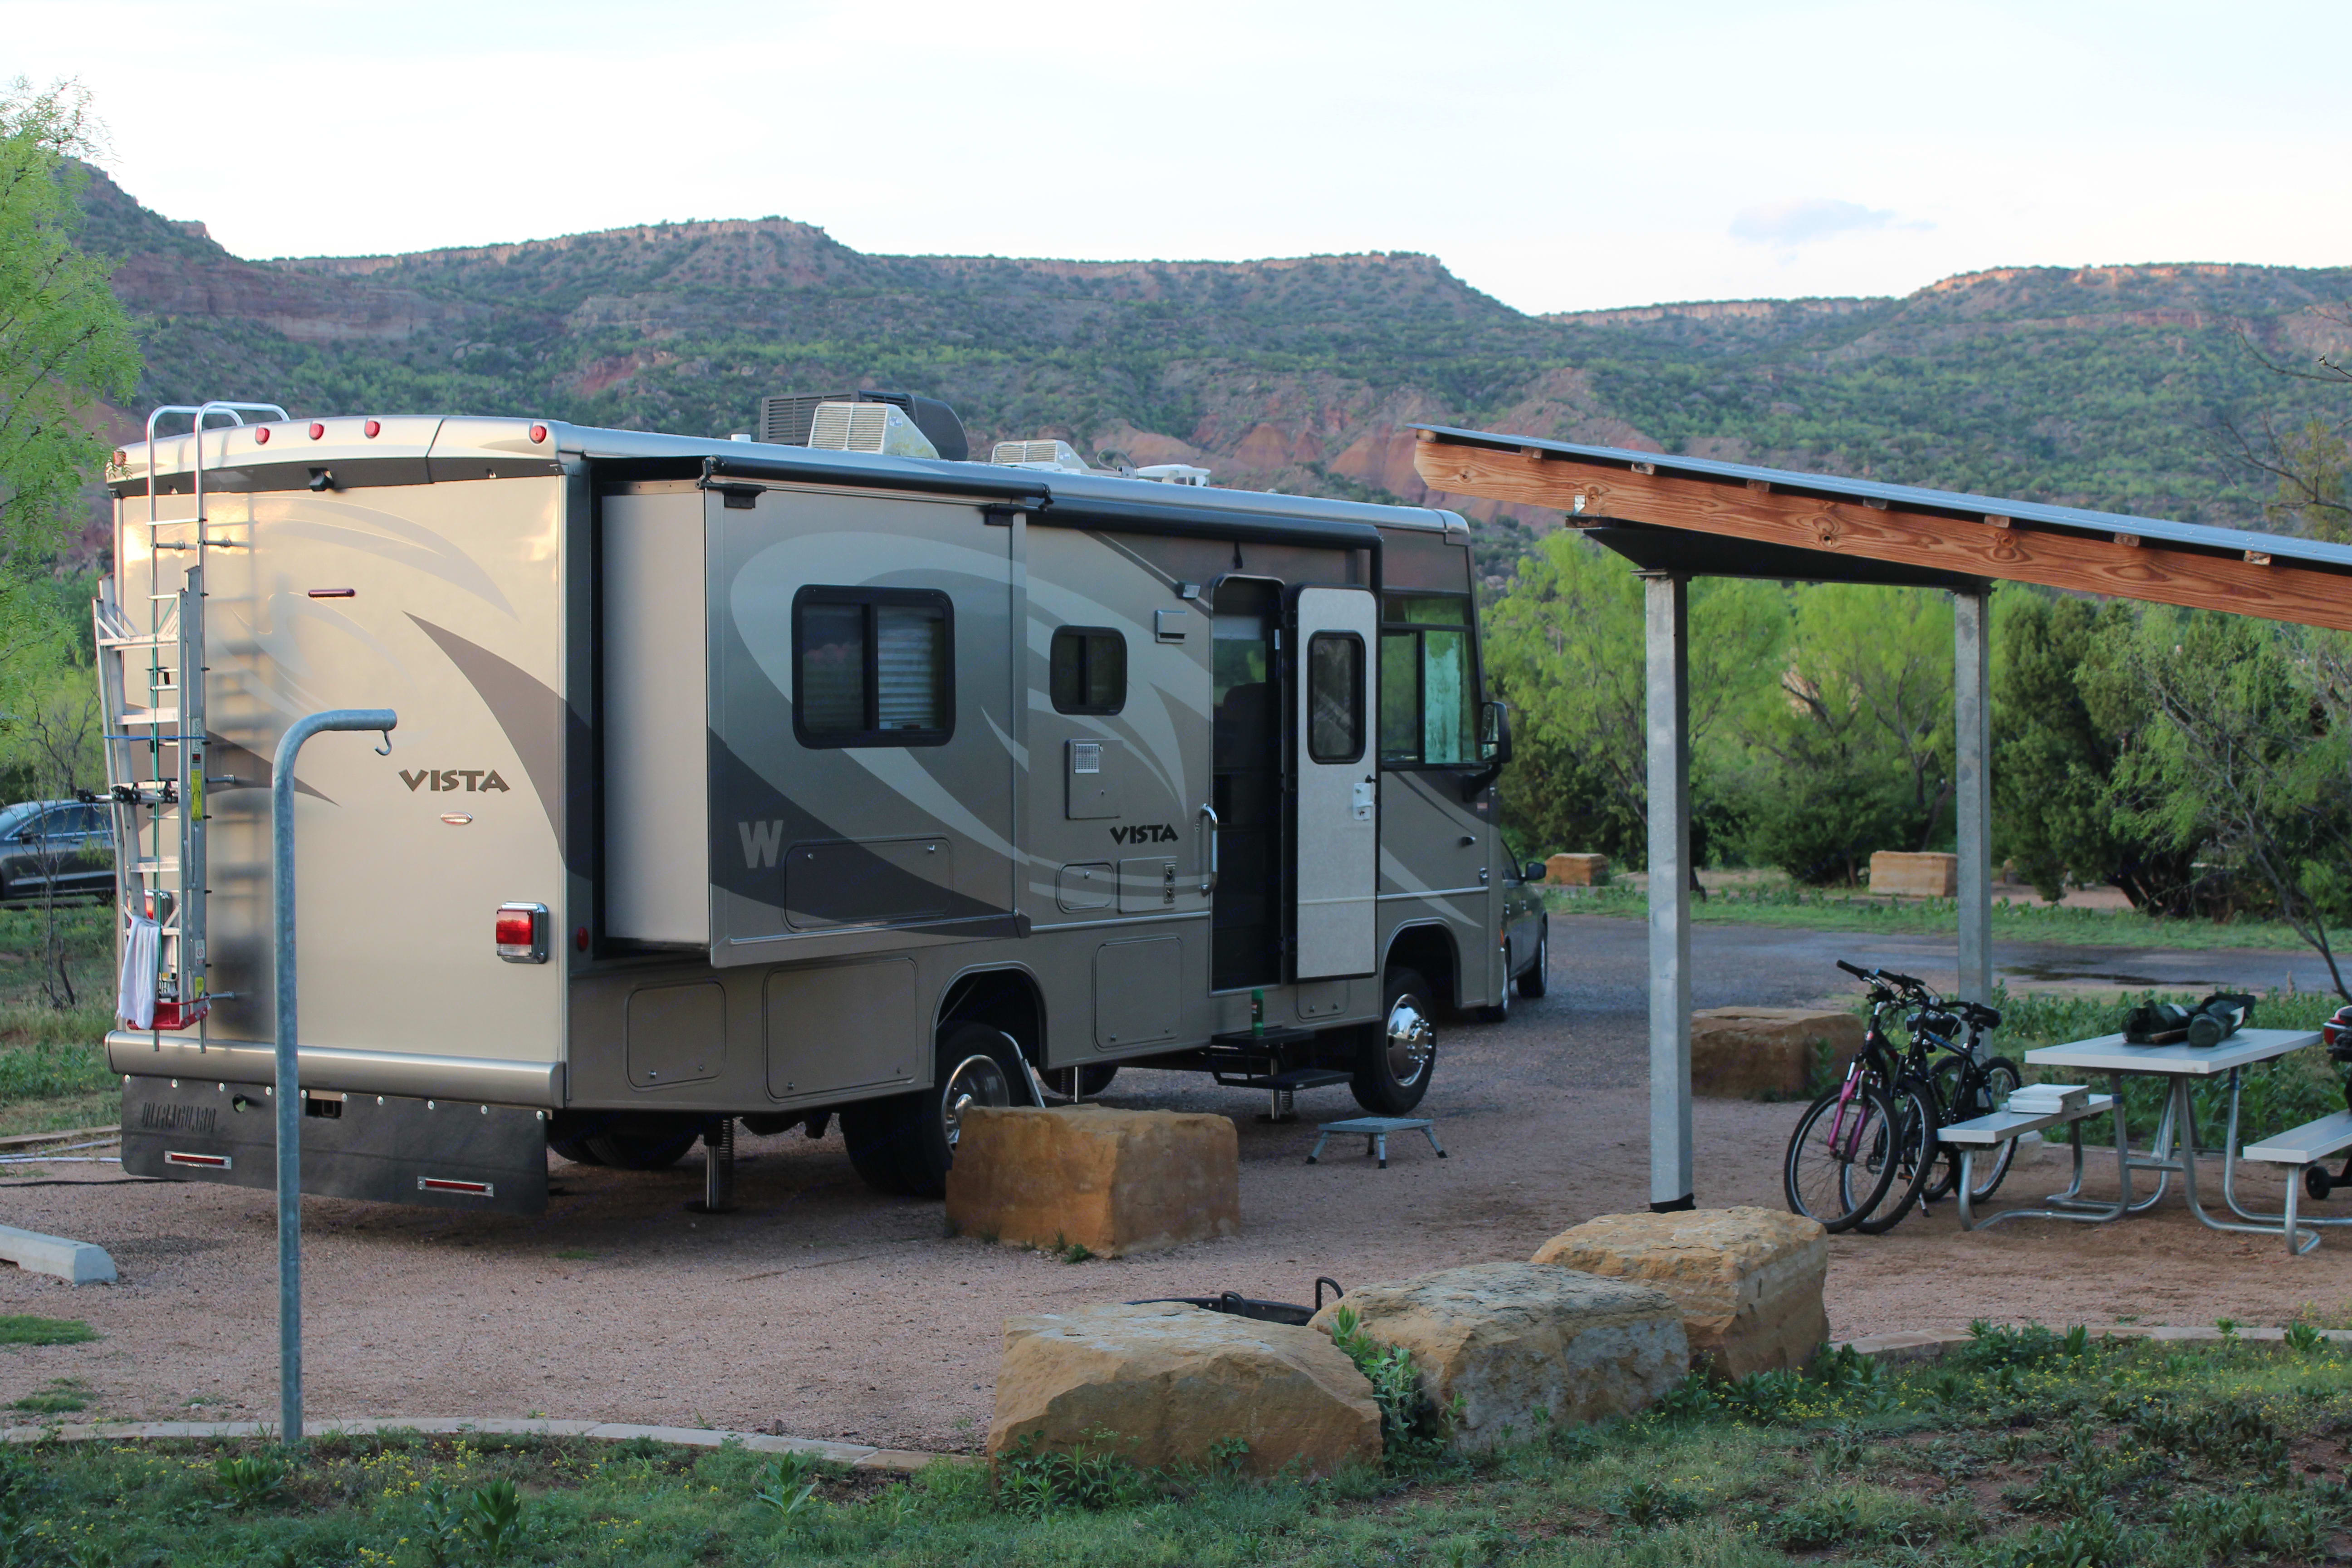 Camping in Palo Duro Canyon, Texas. Winnebago Vista 2010